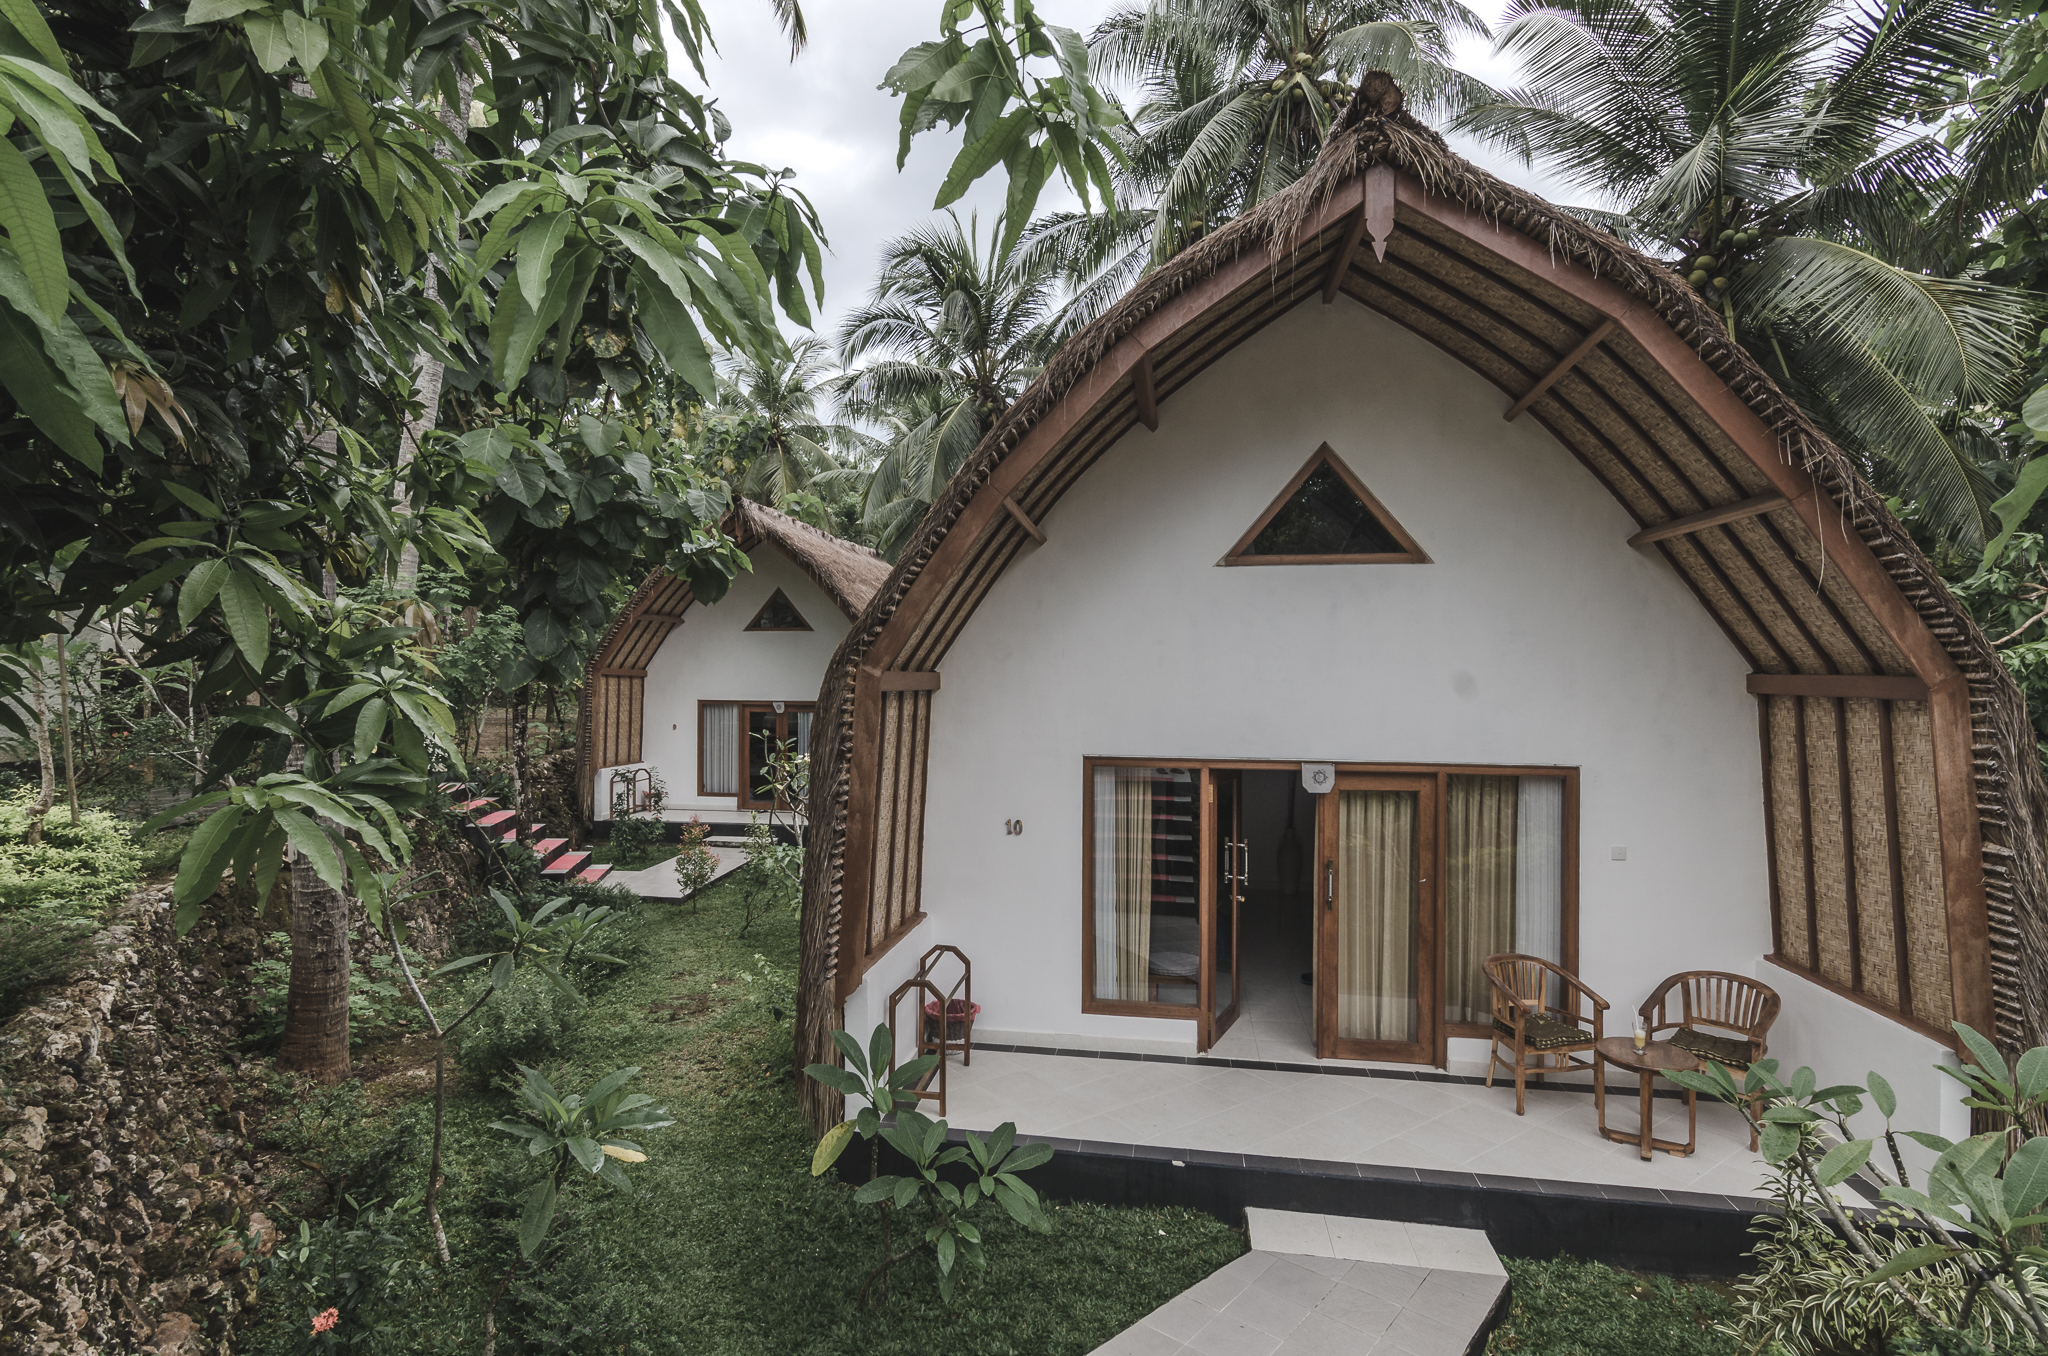 coco-resort-nusa-penida-bali-bungalow-exterior.jpg